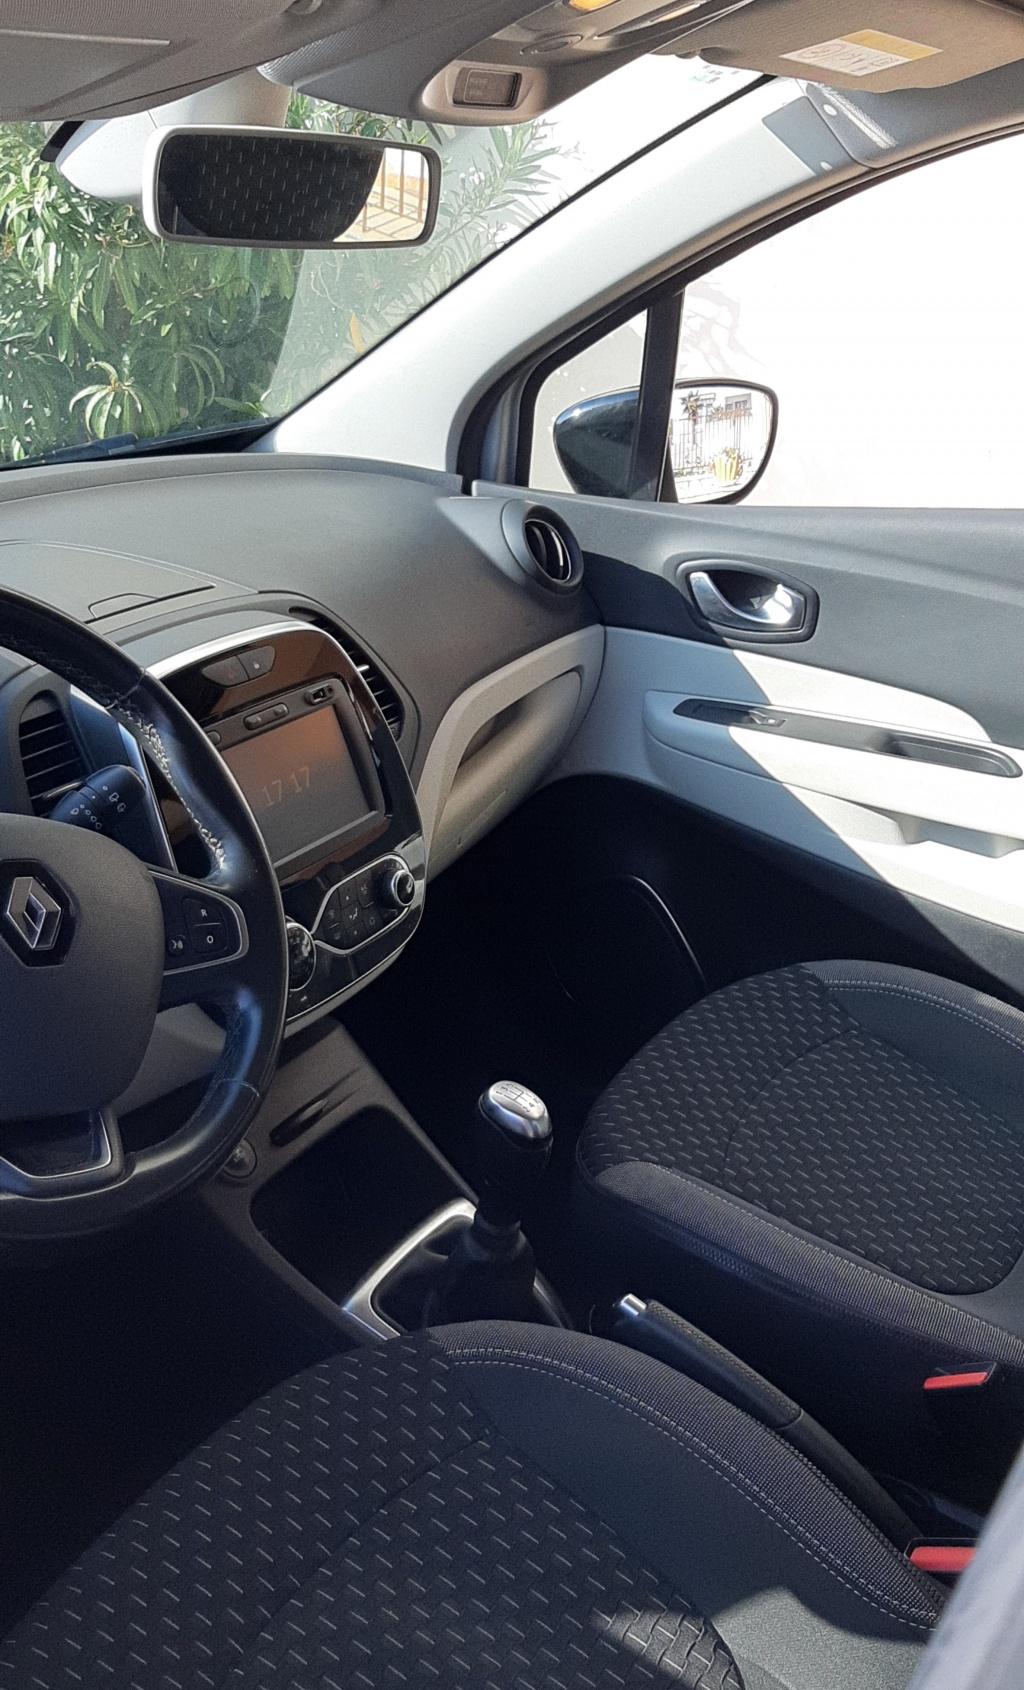 Renault Captur Tce 90, 2017 godina, 46000 km